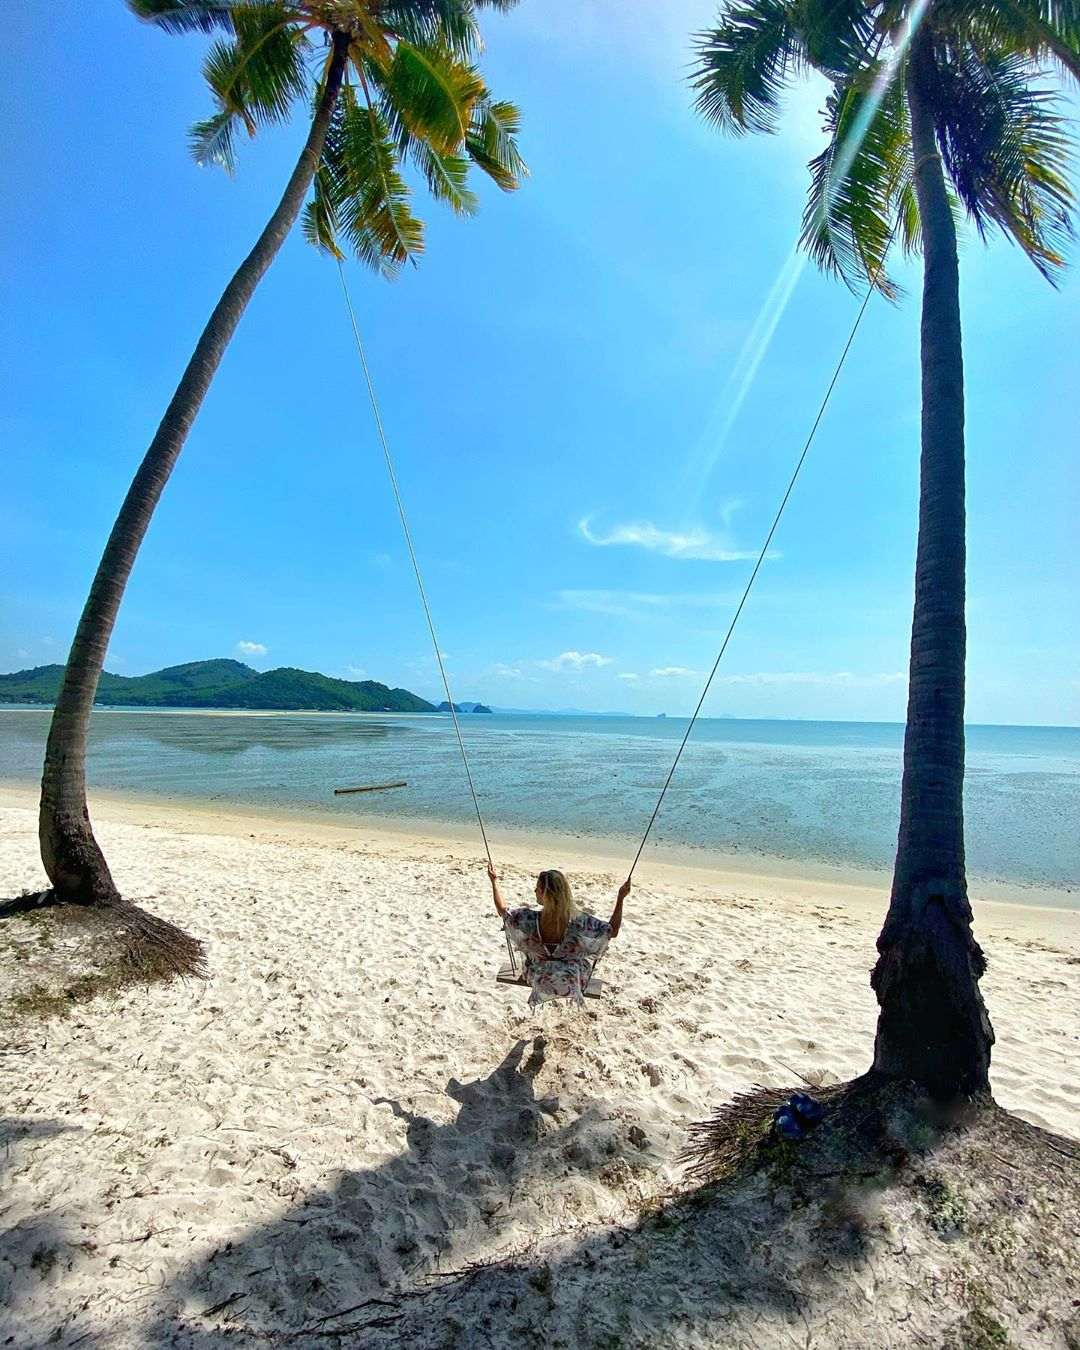 Girl rocking at Laem Had Beach on Koh Yao Yai